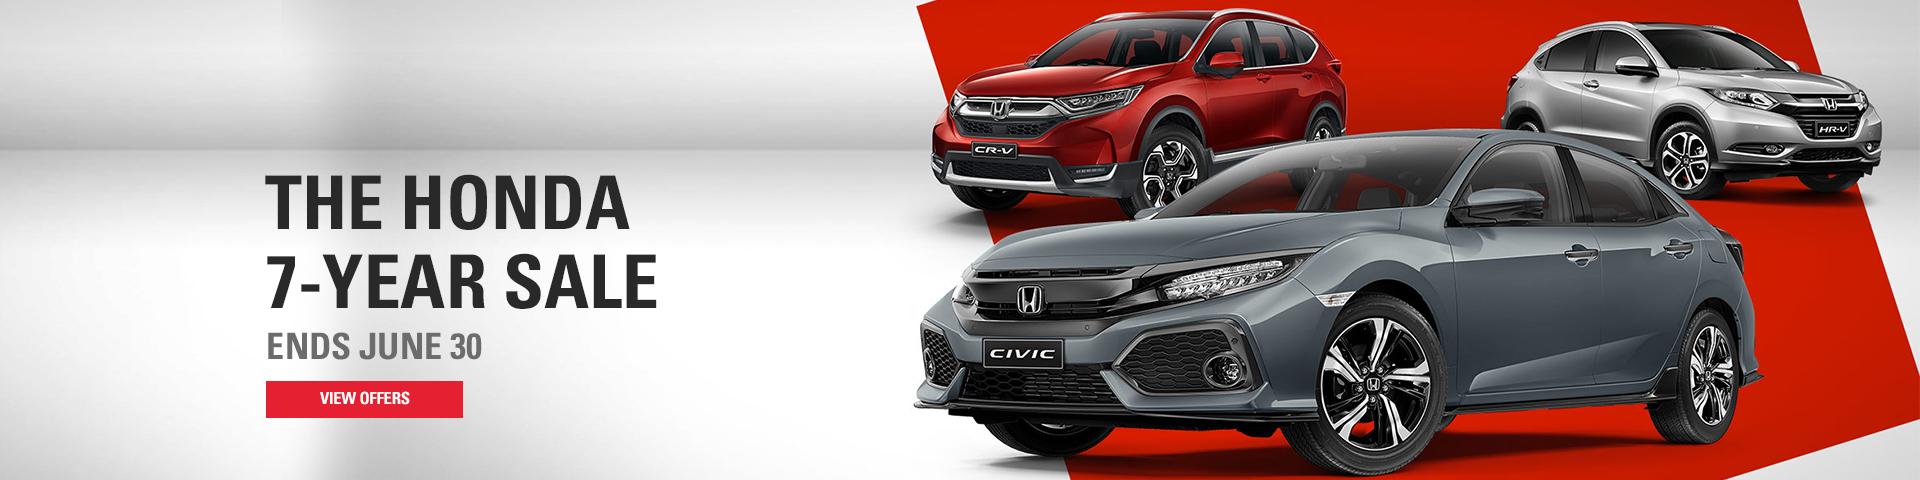 The Honda 7-Year Sale